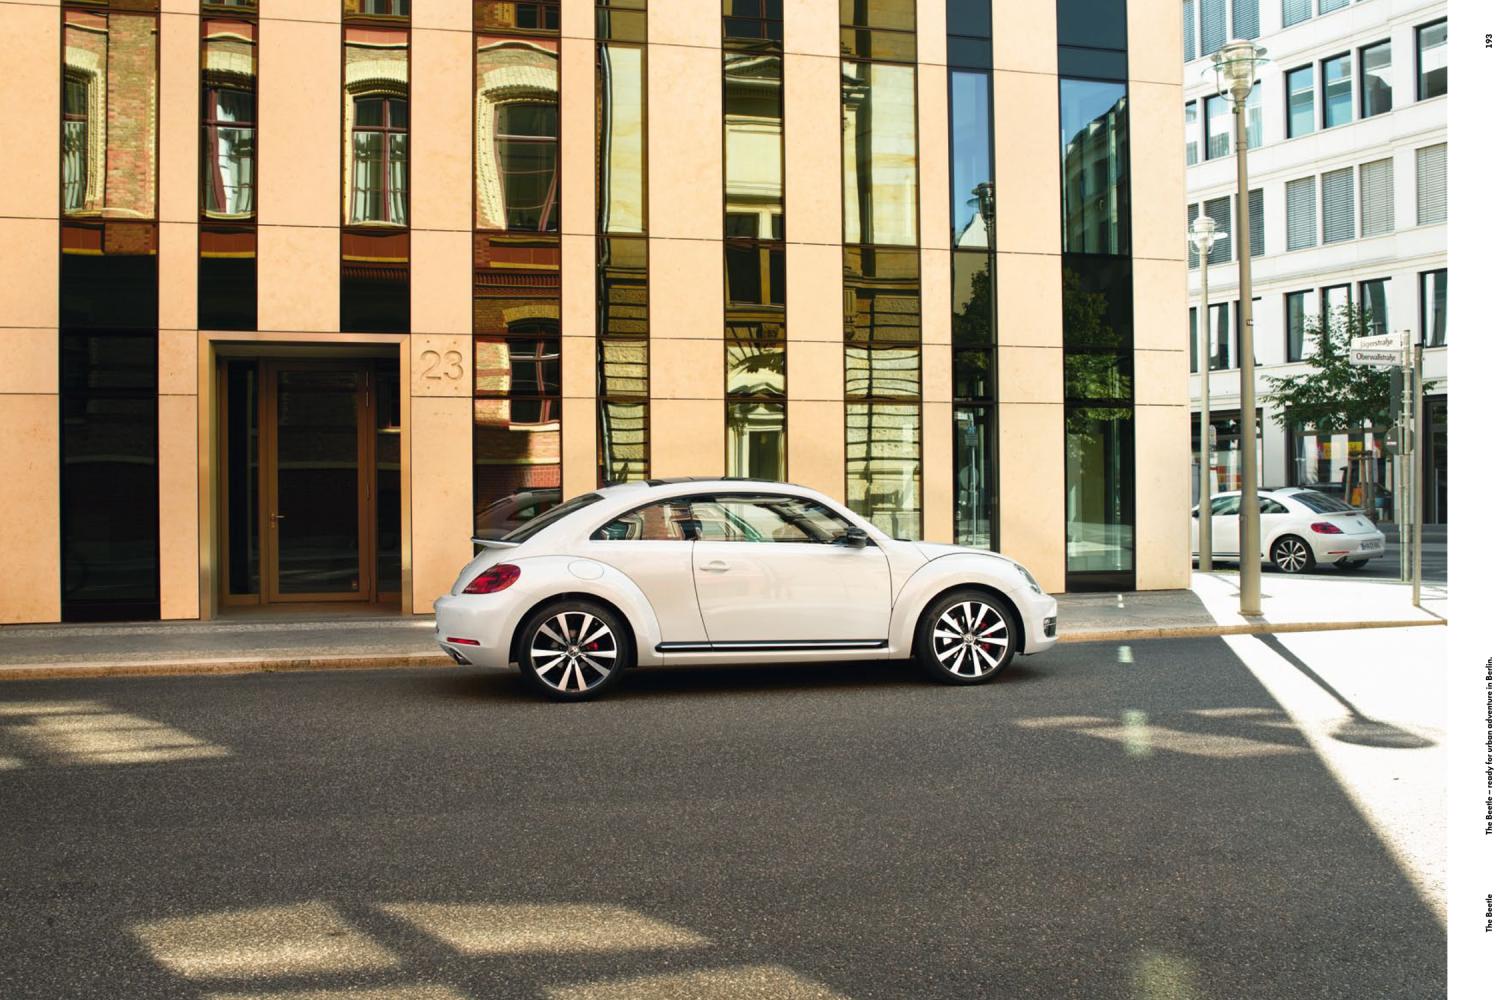 Rene_Staud_VW_Beetle_5